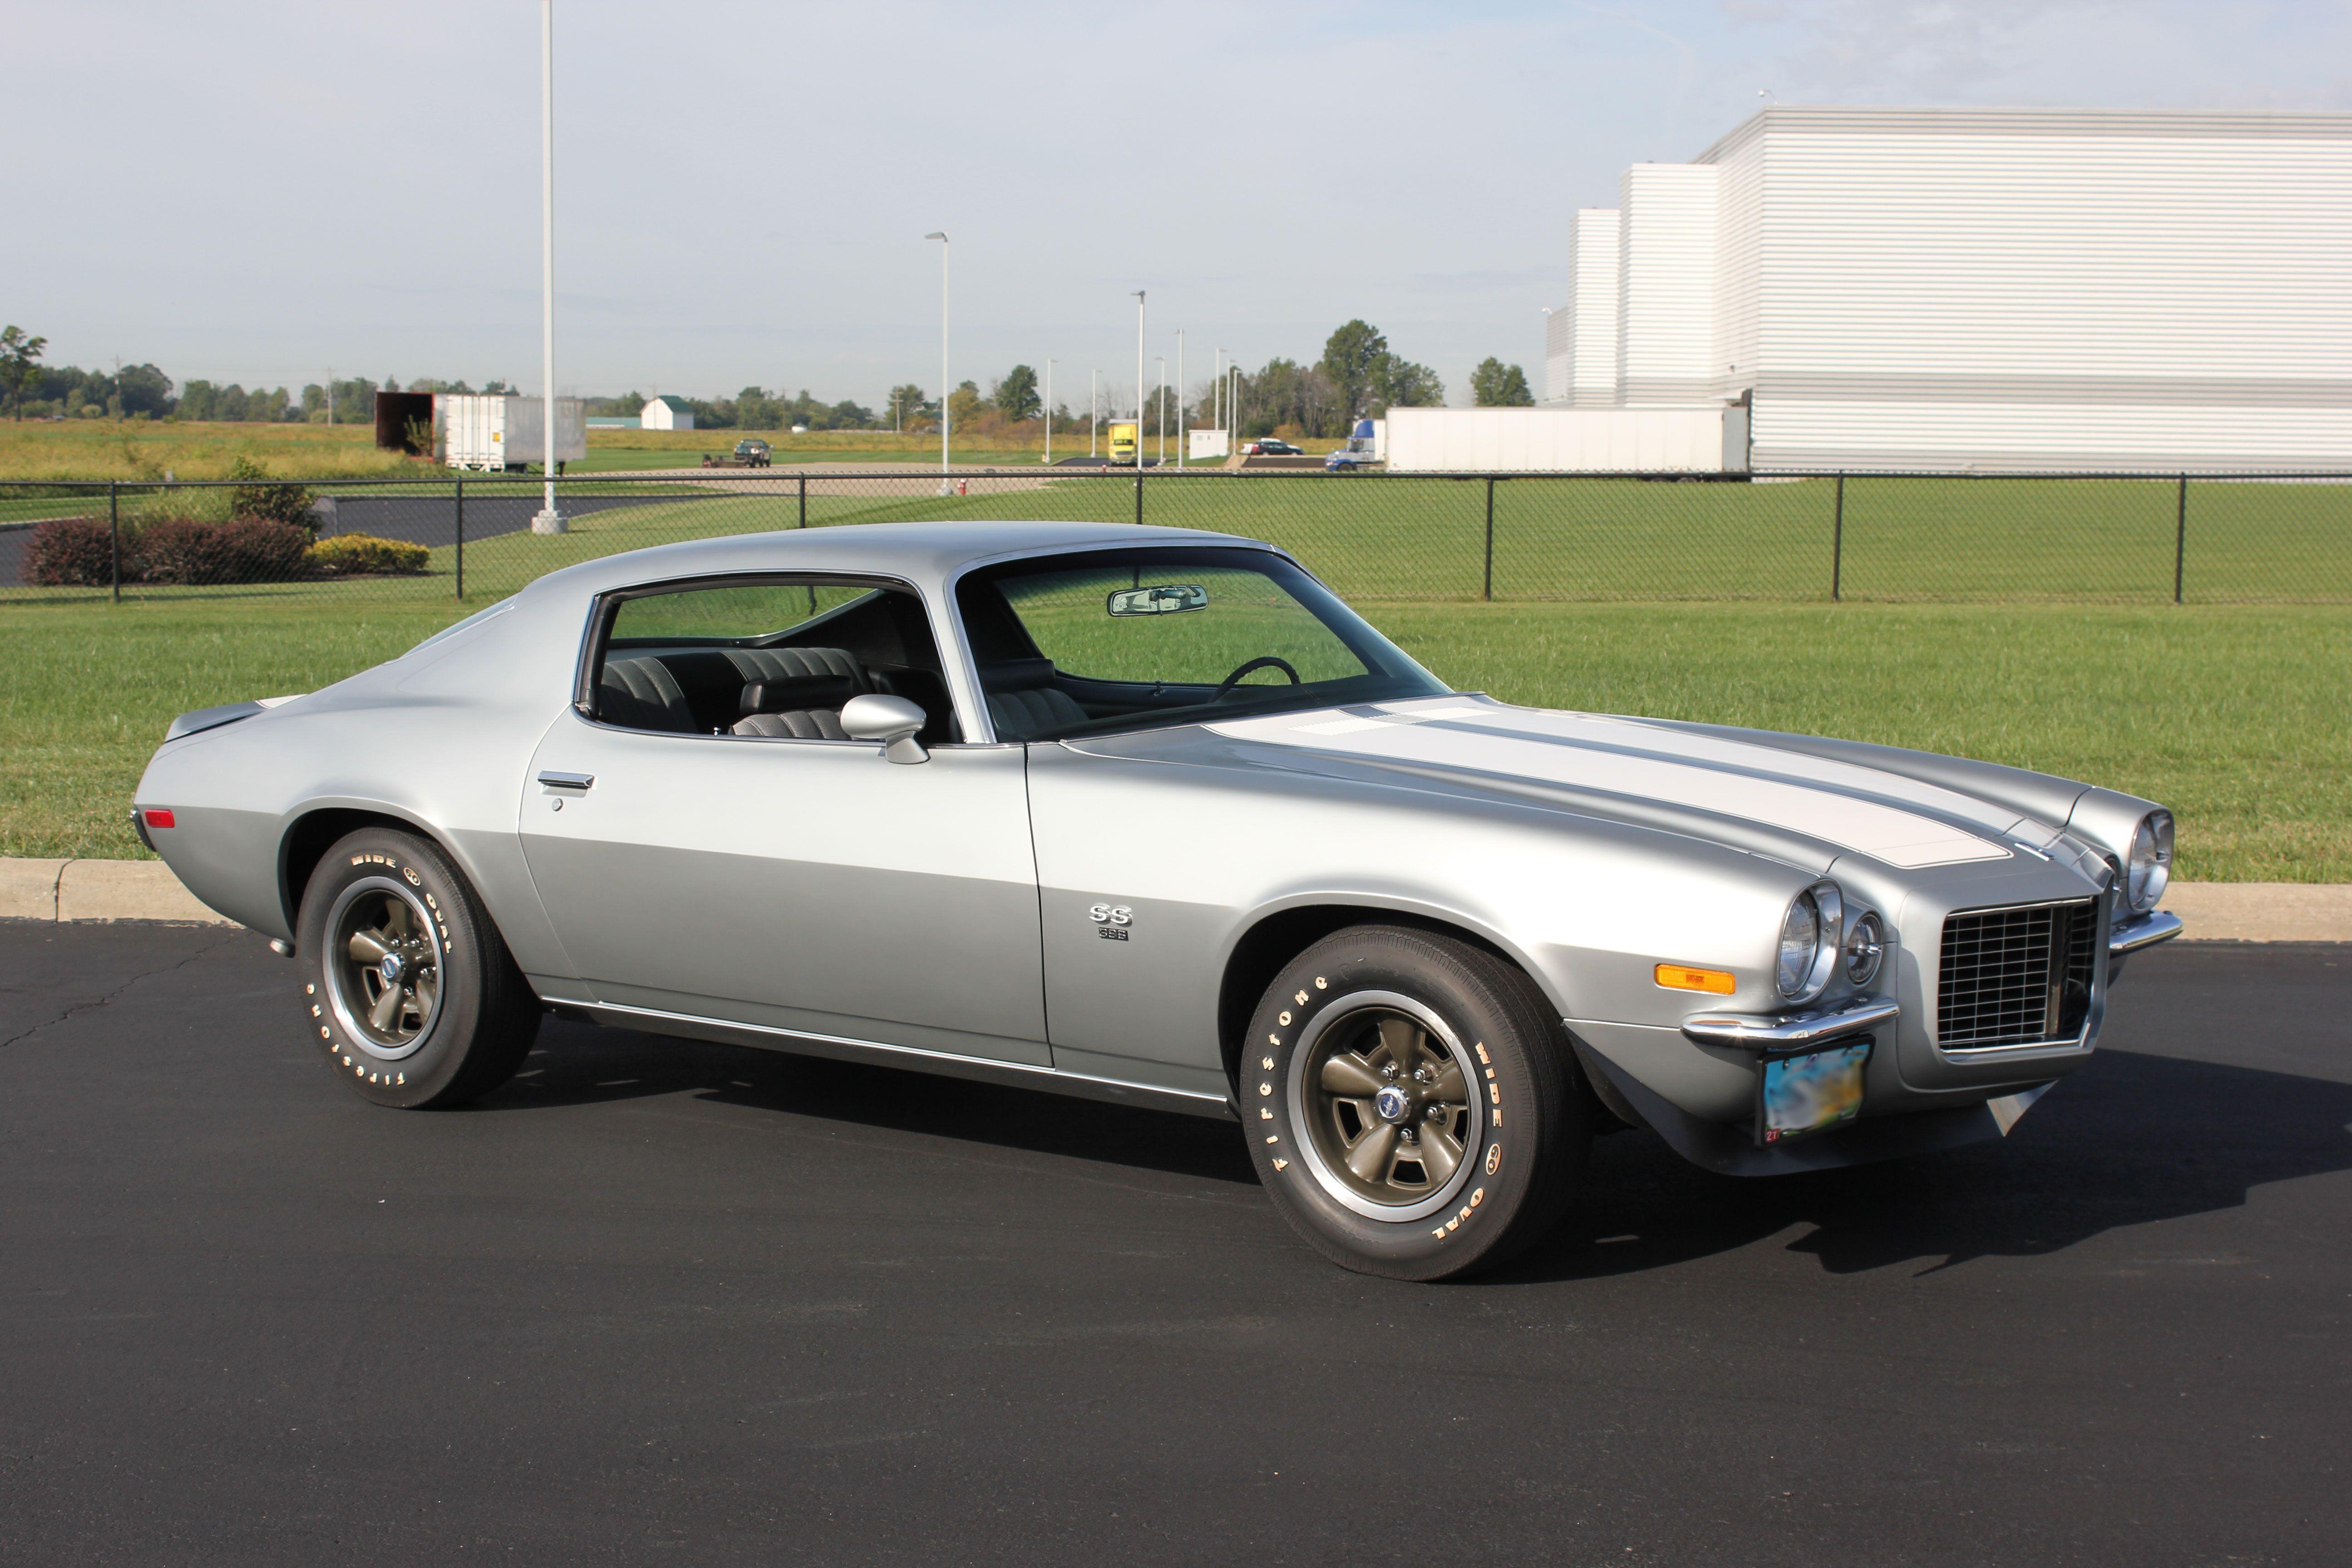 1970 12 chevrolet camaro rsss 396 1970 12 chevrolet